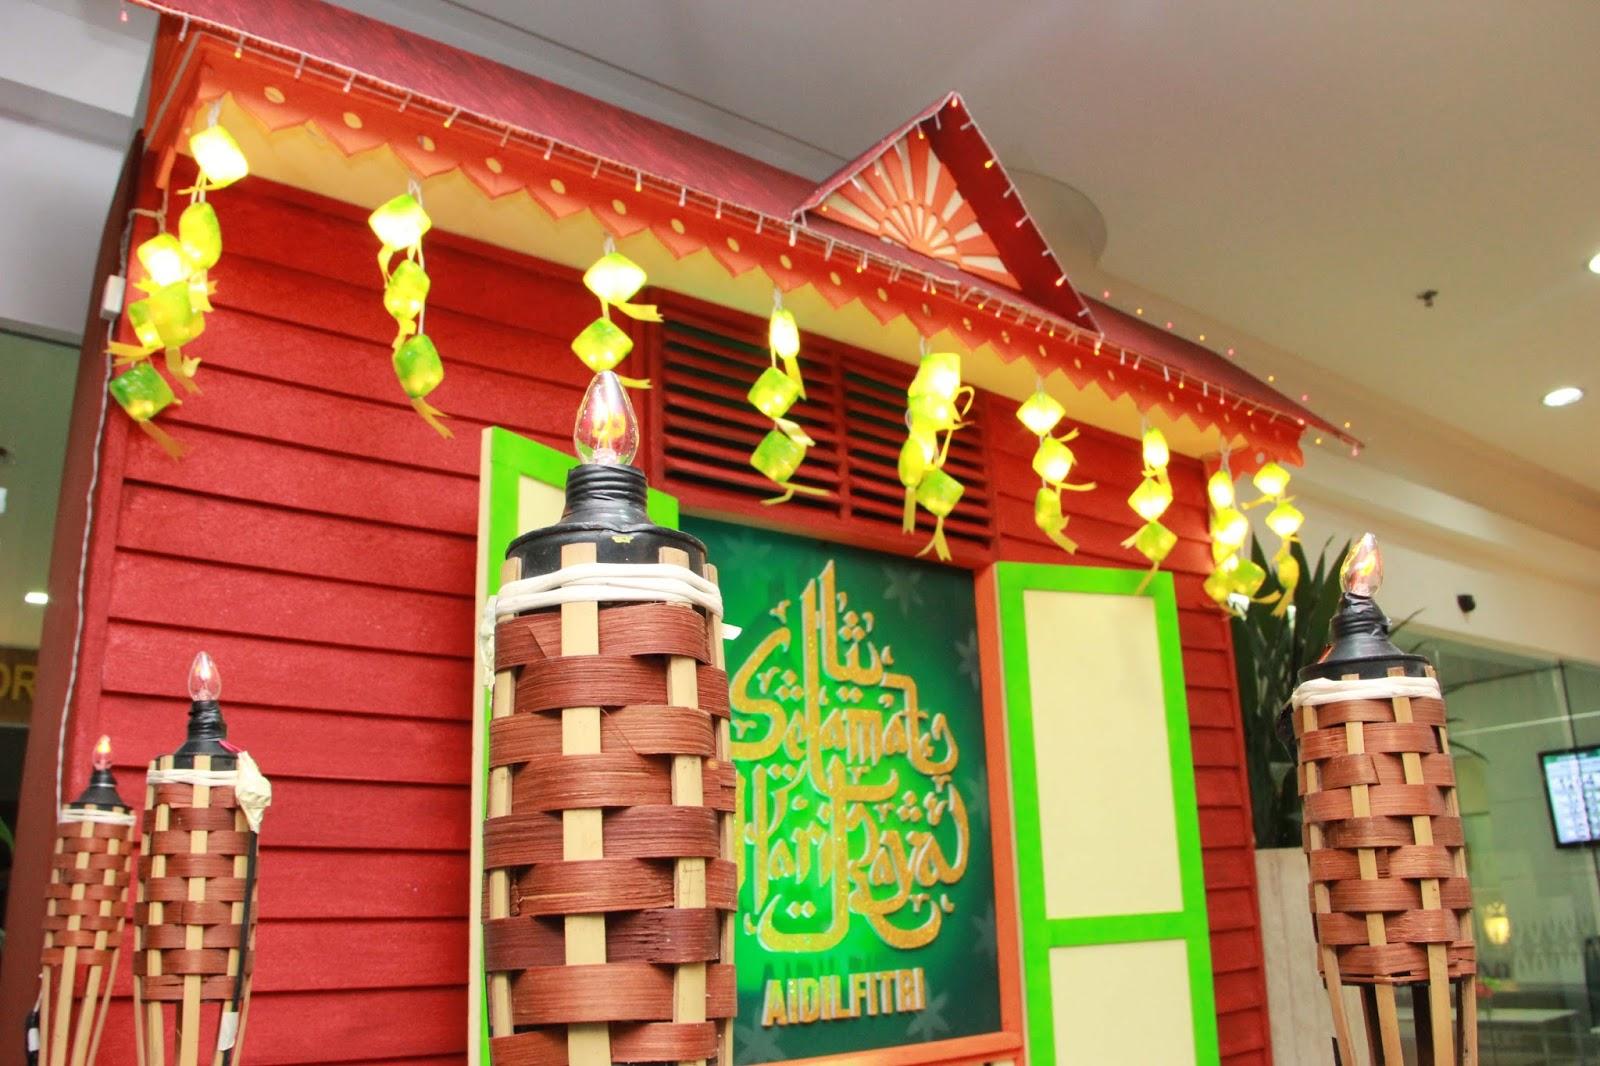 Share a tone enterprise hari raya decoration rumah for Decoration 6